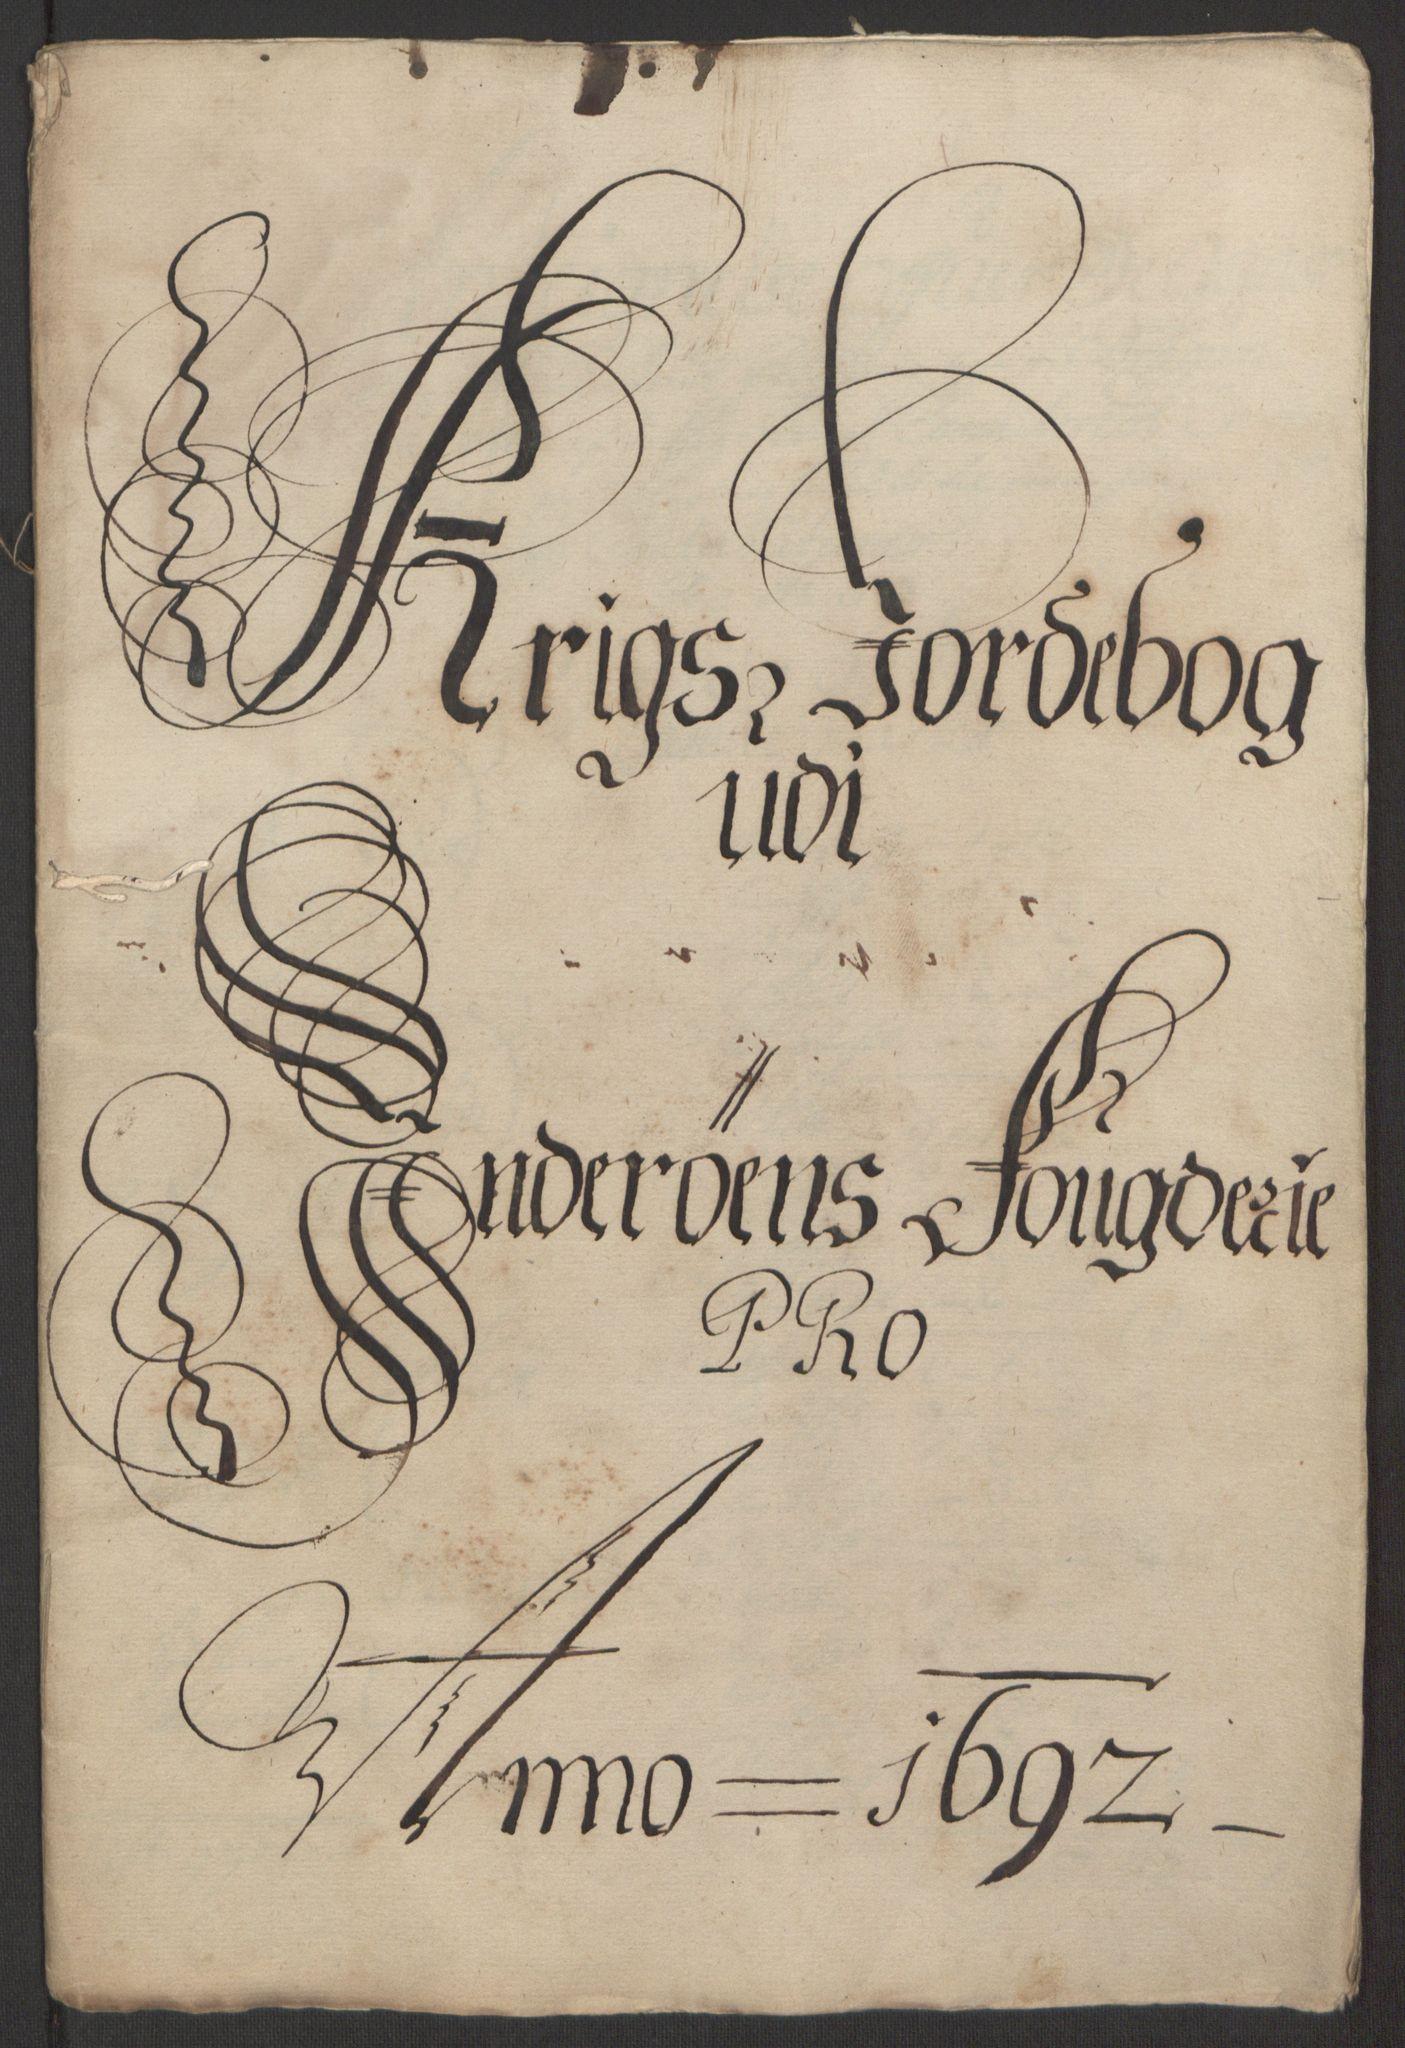 RA, Rentekammeret inntil 1814, Reviderte regnskaper, Fogderegnskap, R63/L4308: Fogderegnskap Inderøy, 1692-1694, s. 203